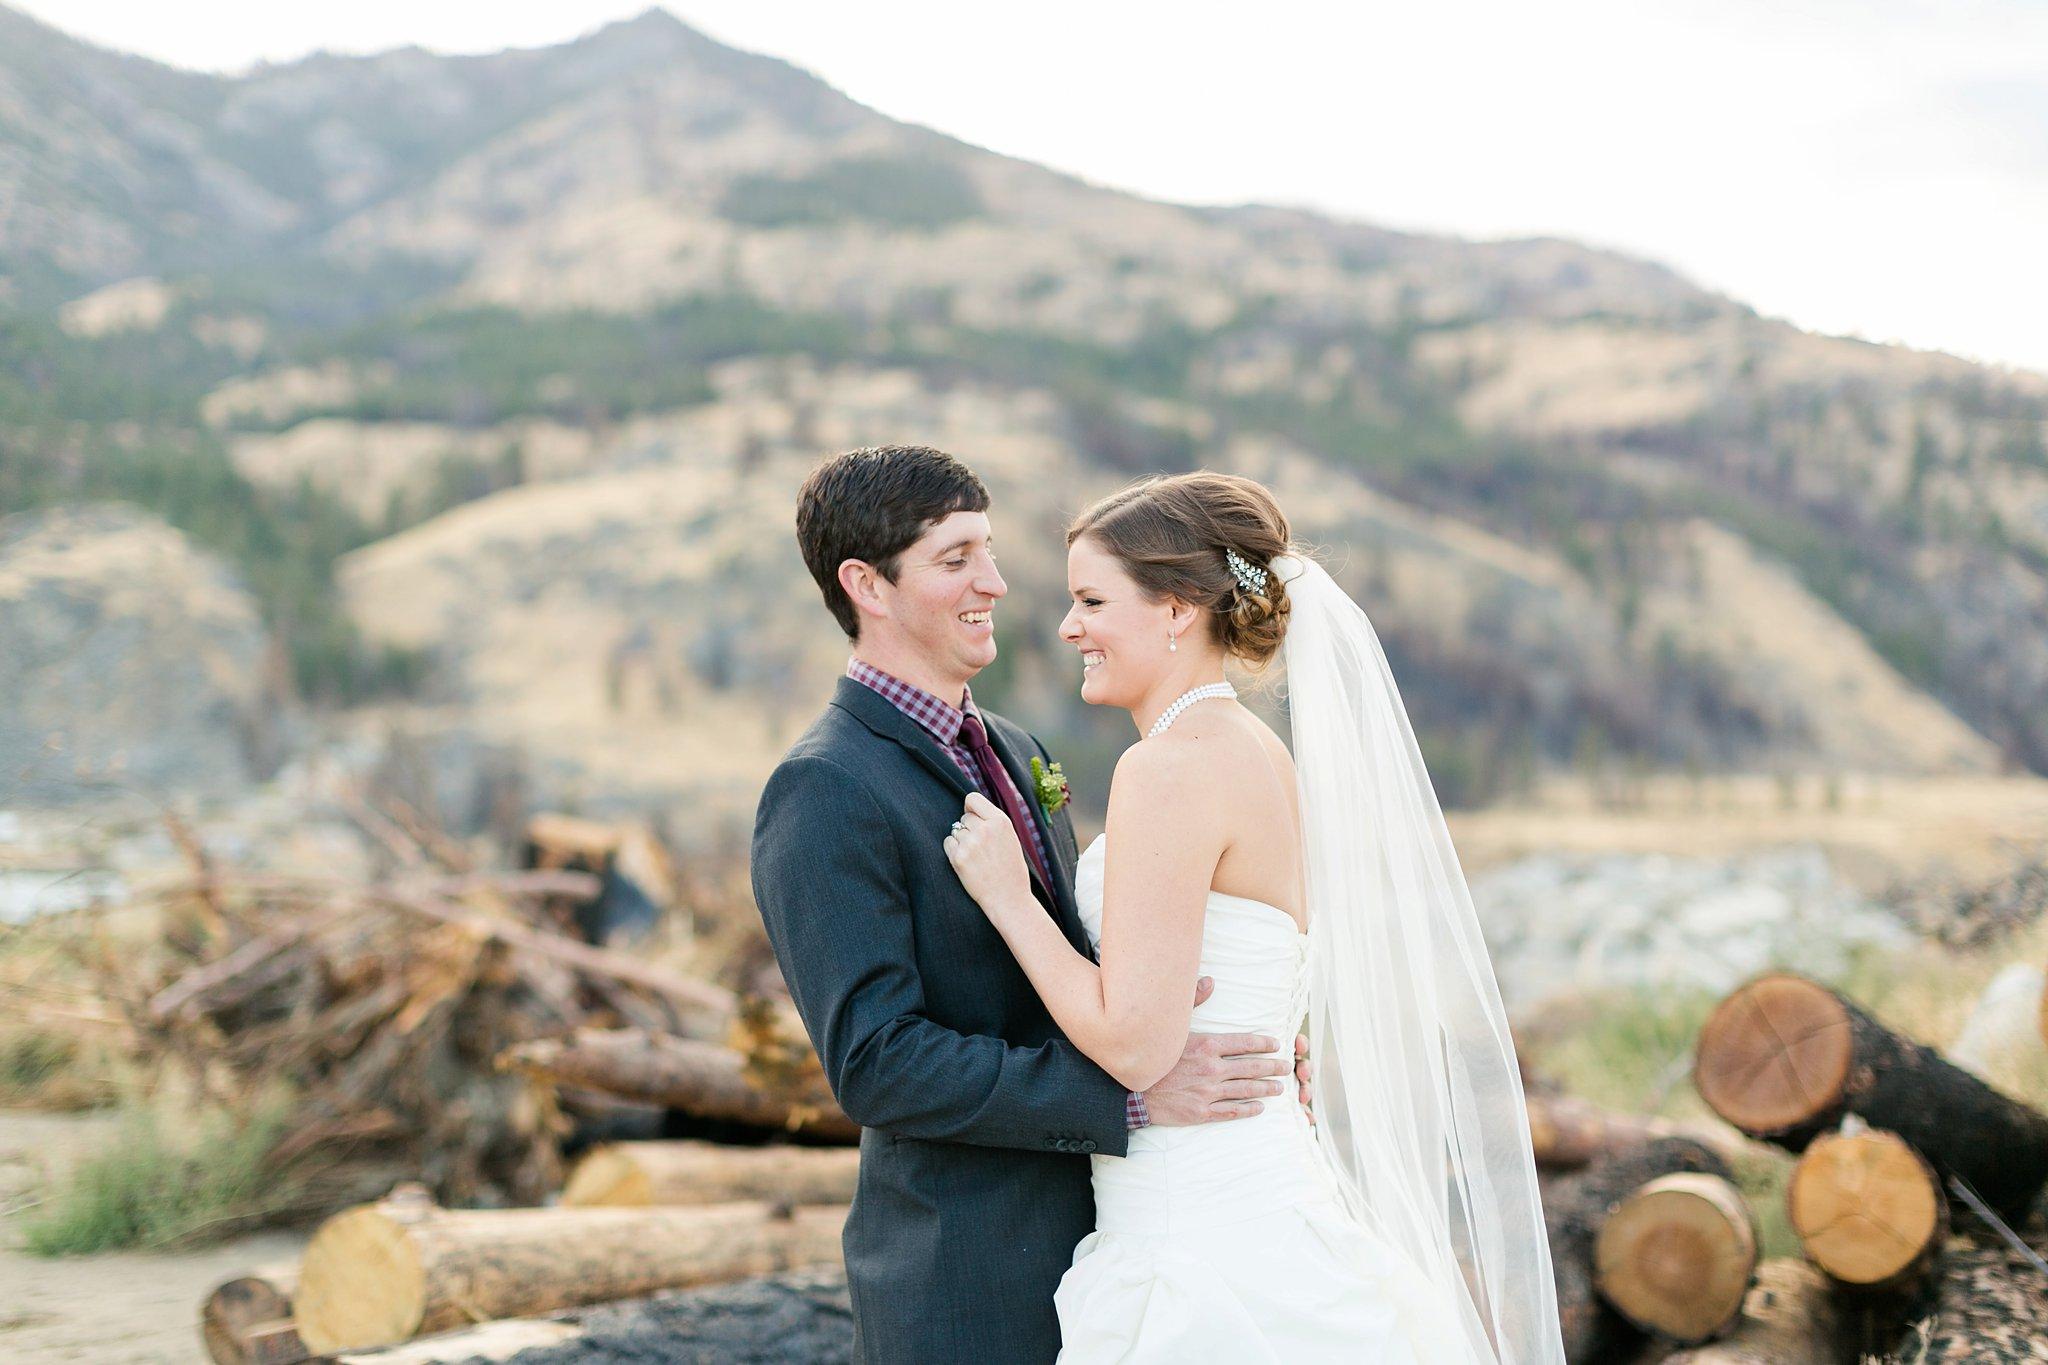 Chelan Washington Wedding Photos Megan Kelsey Photography Delight Wedding Workshop Styled Shoot Annalee & Scot-161.jpg